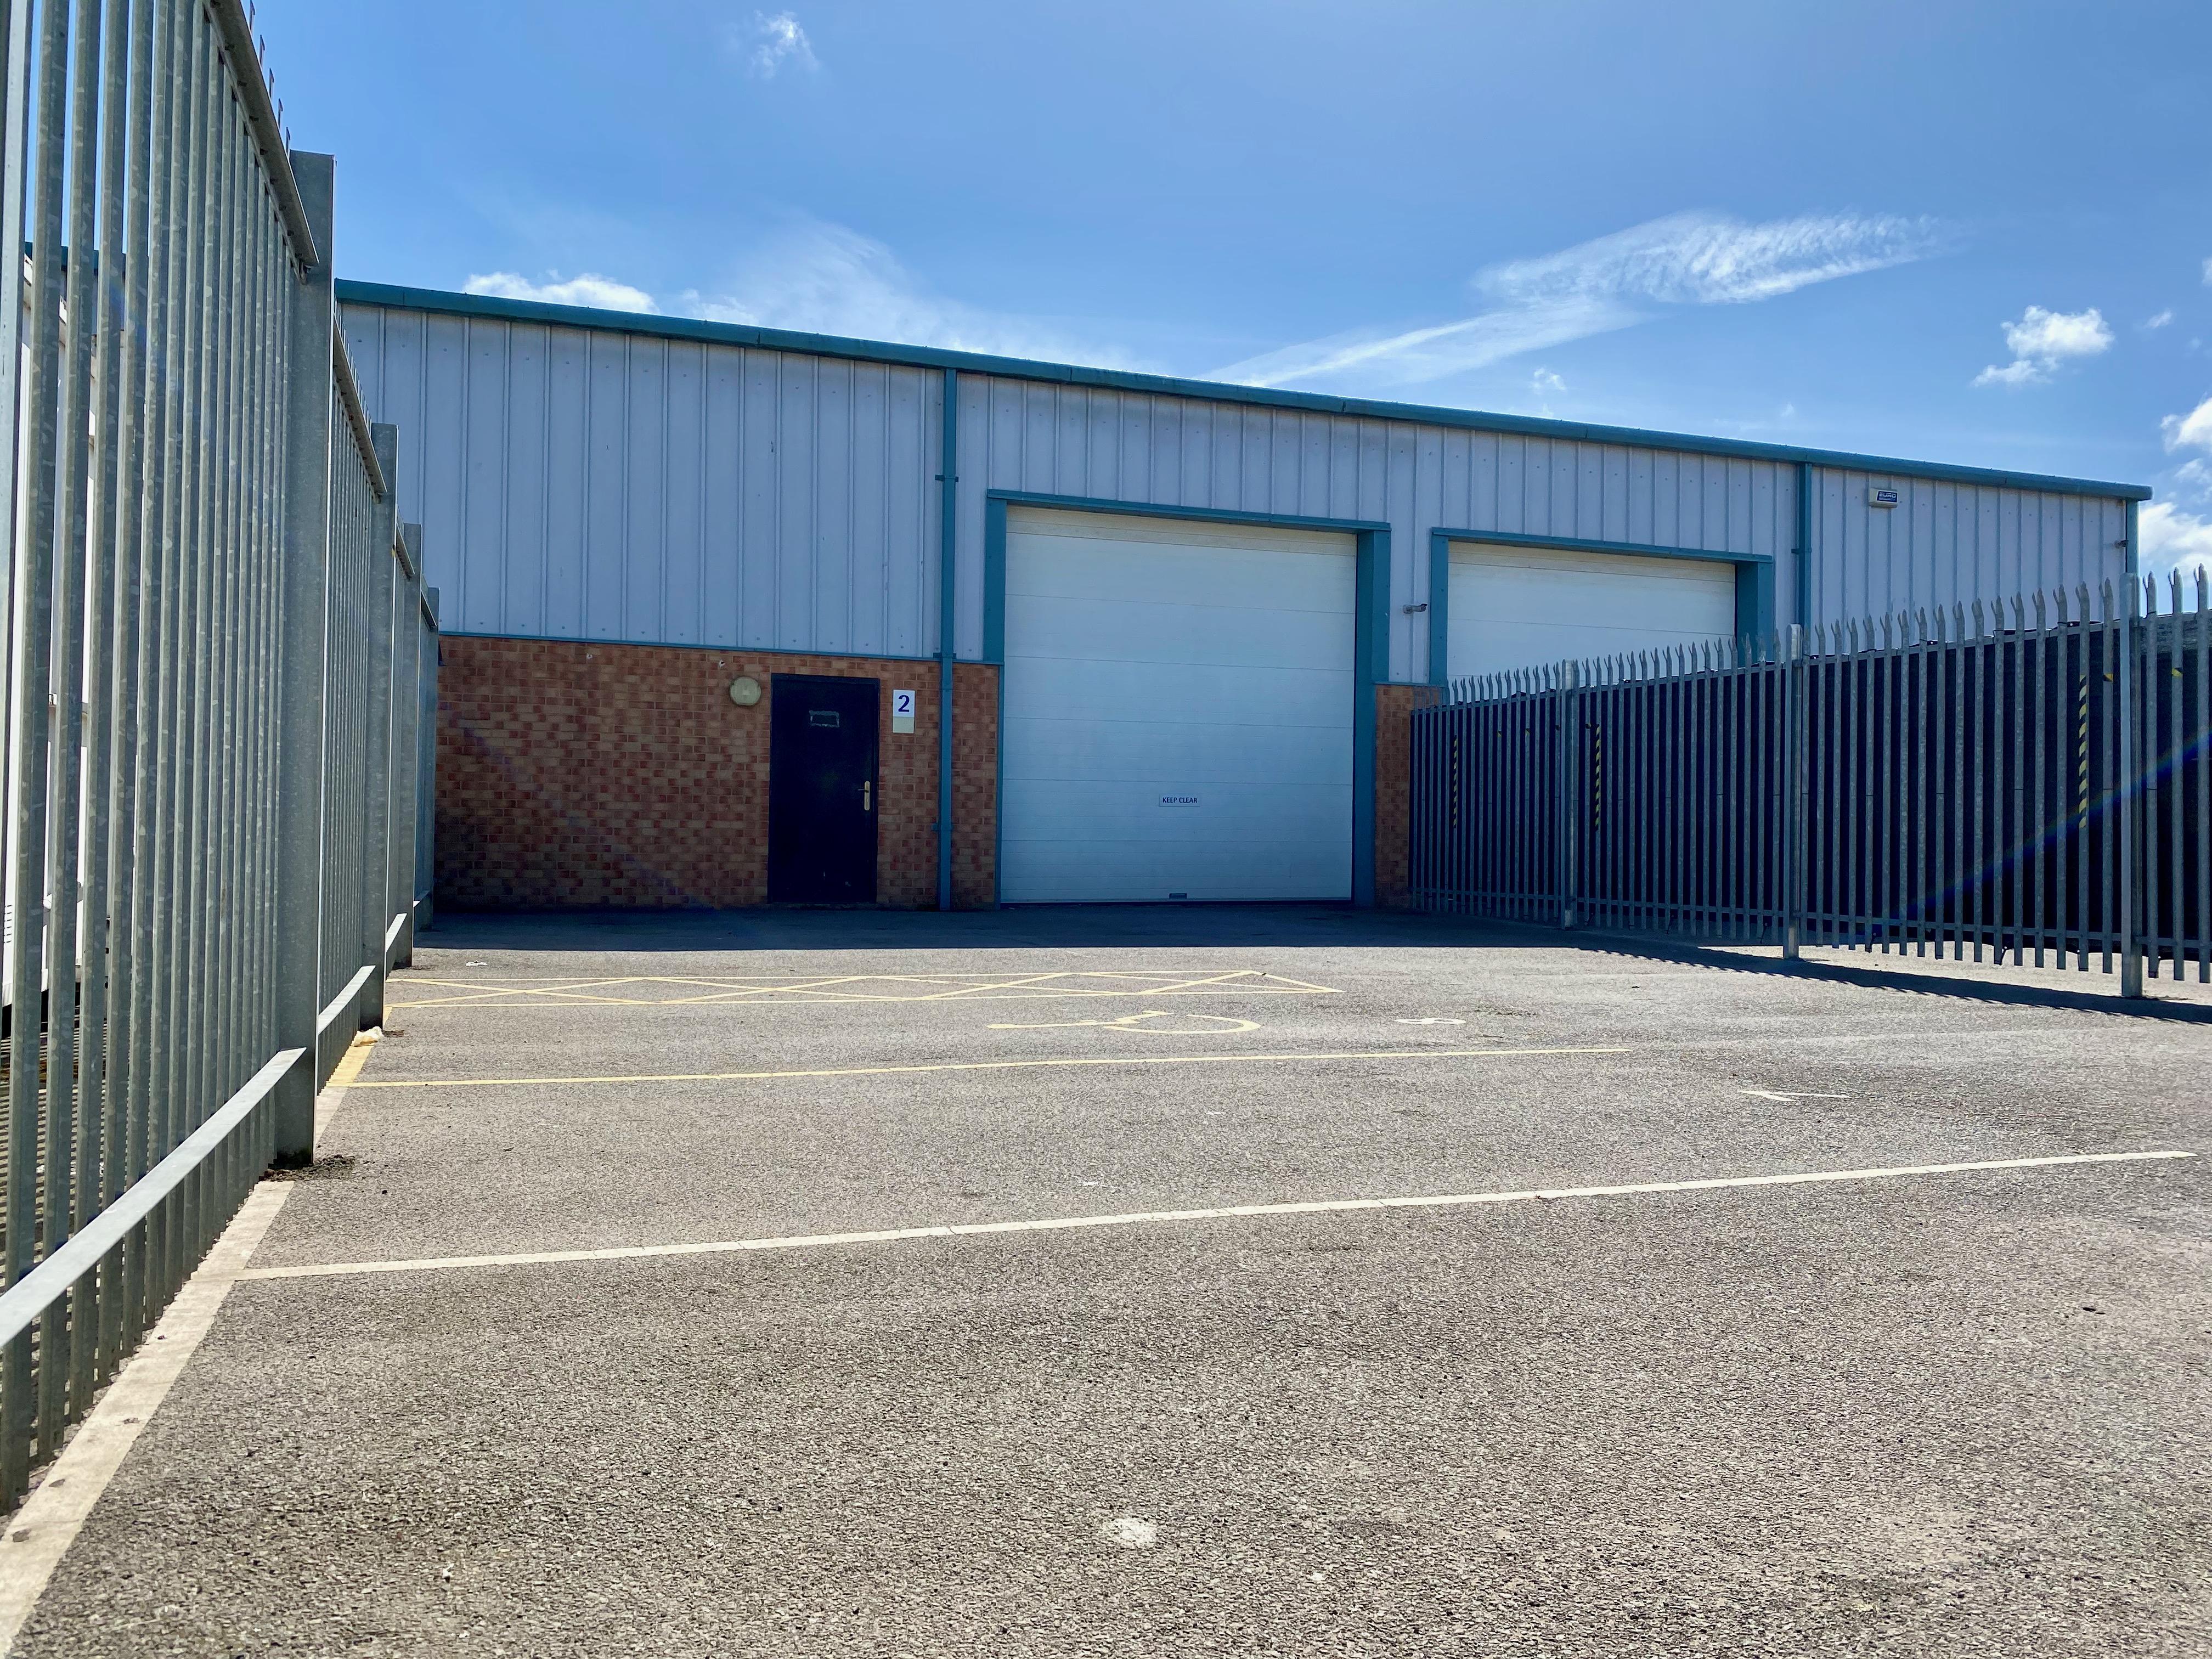 Unit 2 Moreland Street, Hartlepool, T24 7NL